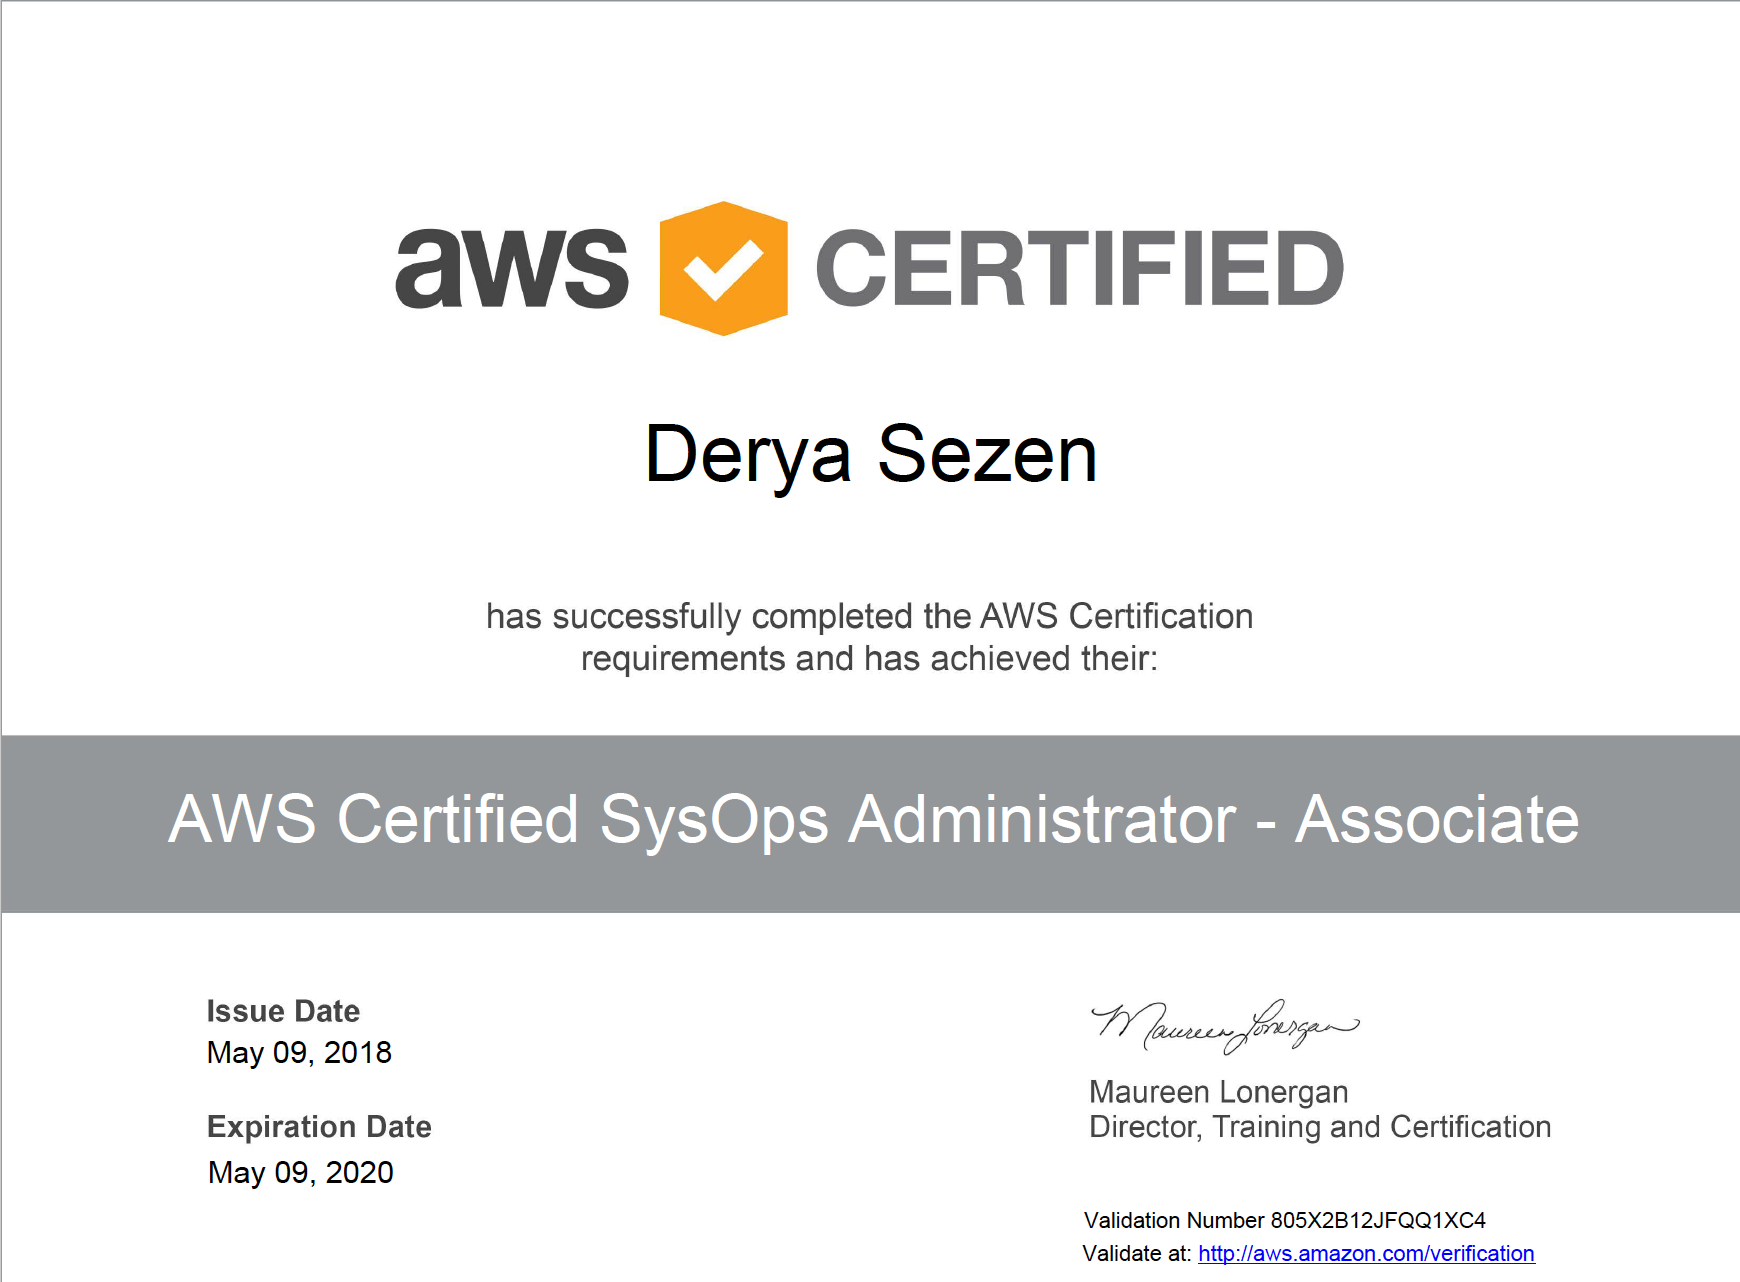 Certificates Derya Sezen